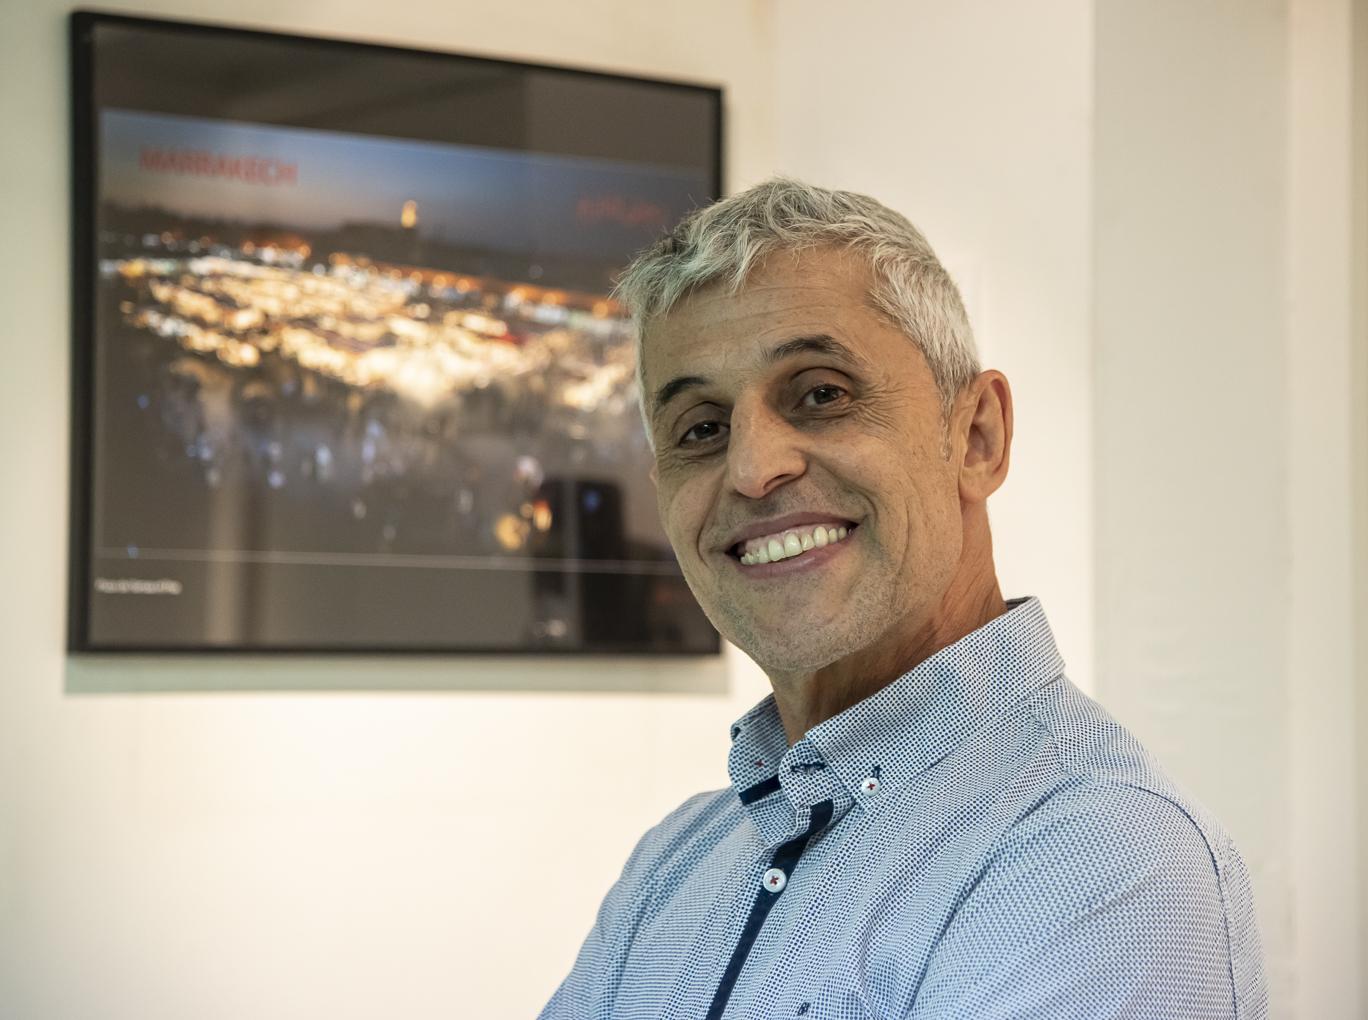 "Veredicte concurs social octubre i inauguració exposicio ""Marrakech"" de Carlos Seisdedos"